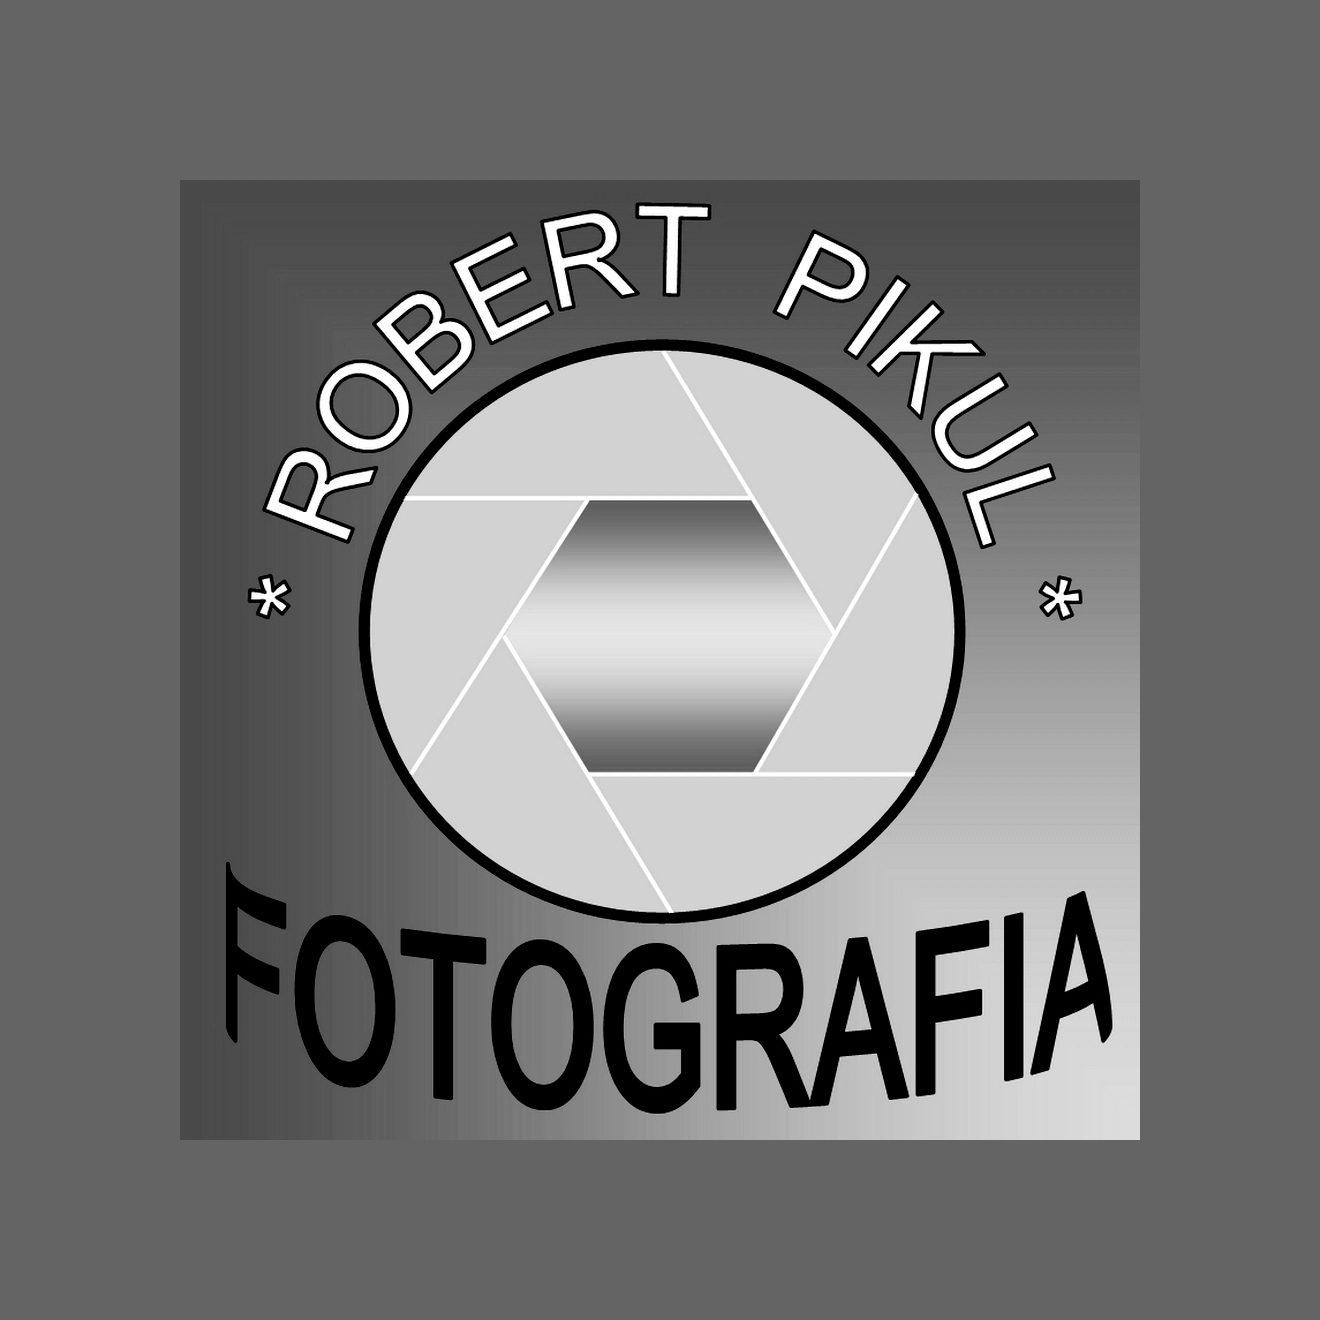 ROBERT PIKUL FOTOGRAFIA